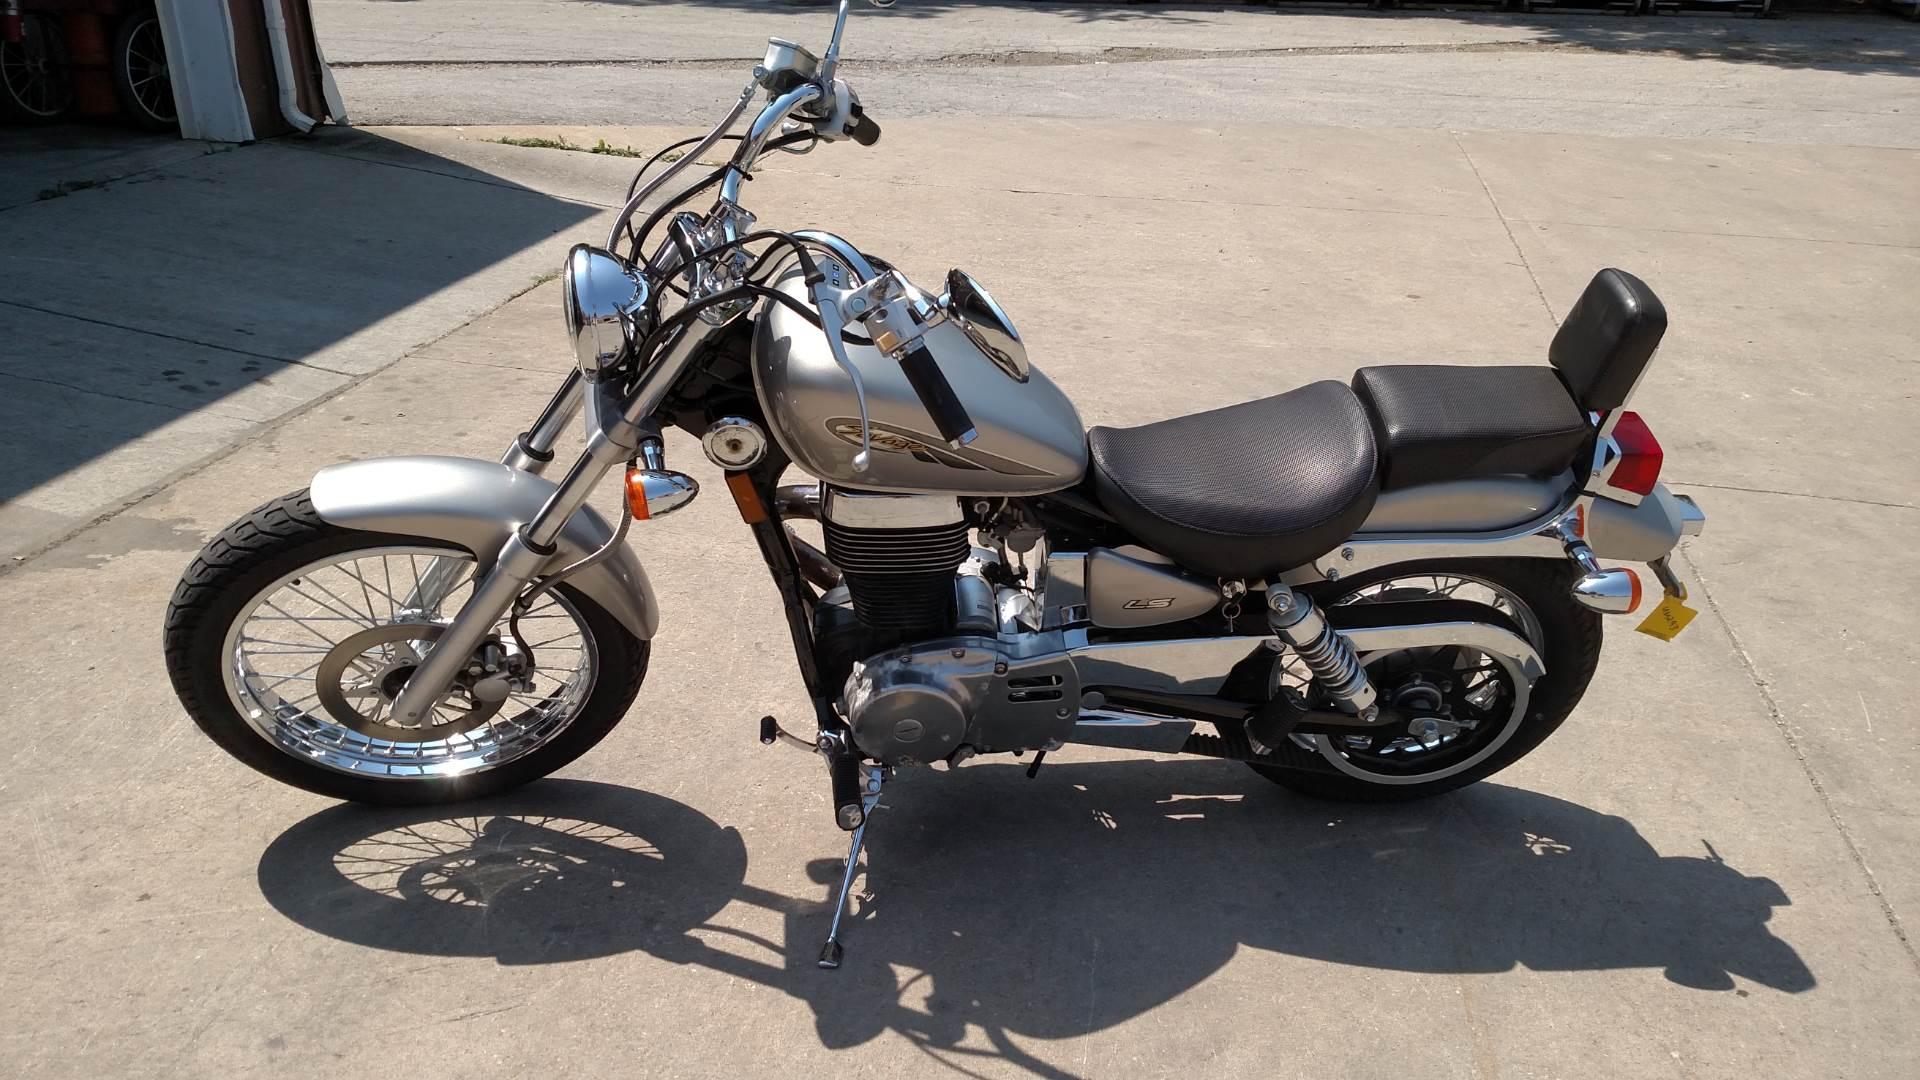 2004 Savage 650 (LS650P)